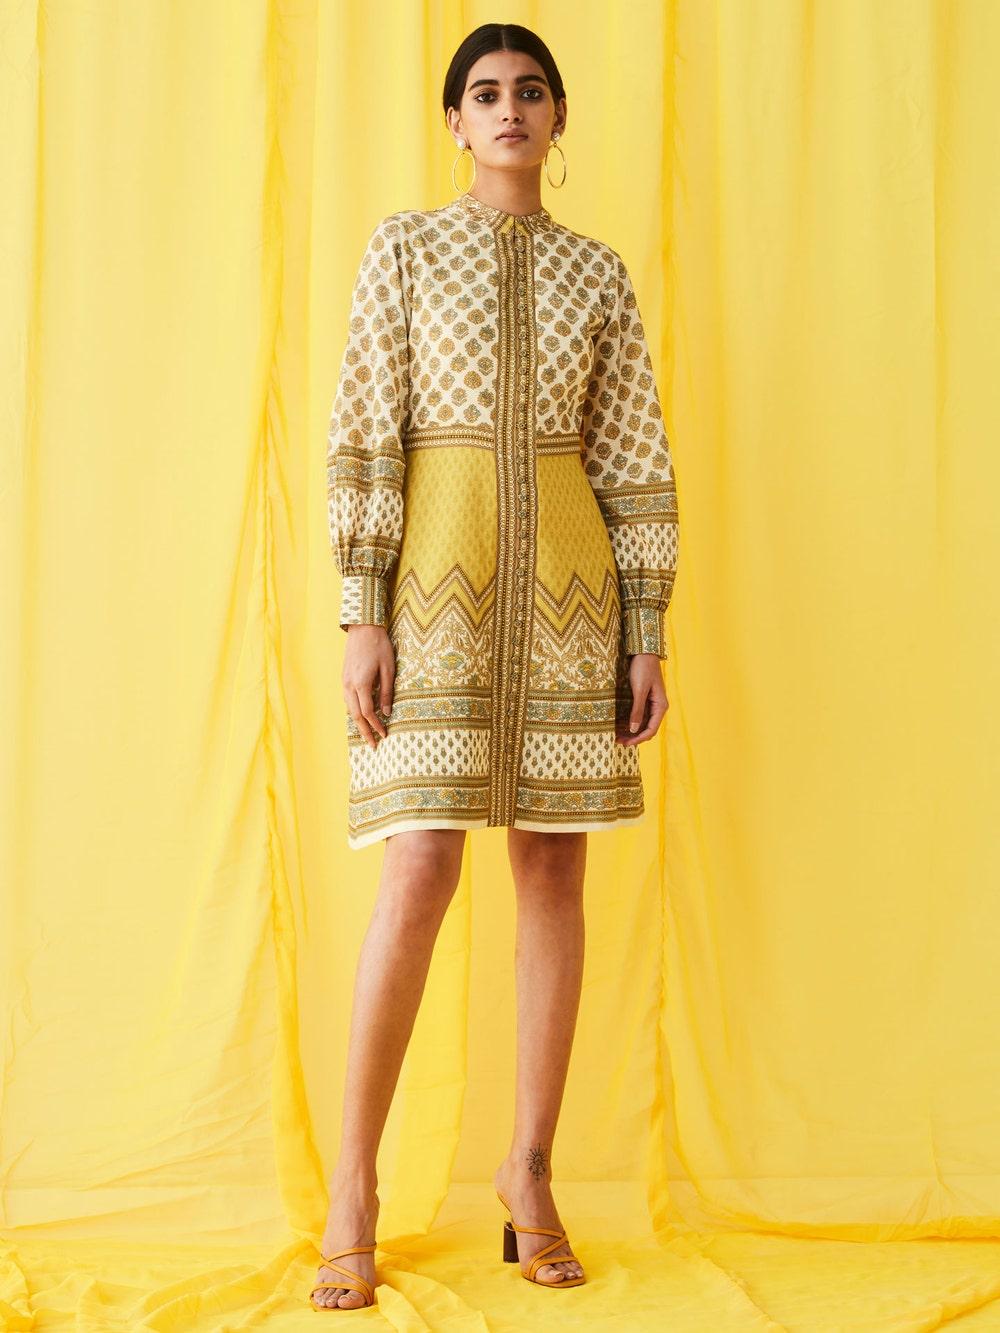 Ecru & Yellow Printed Dress